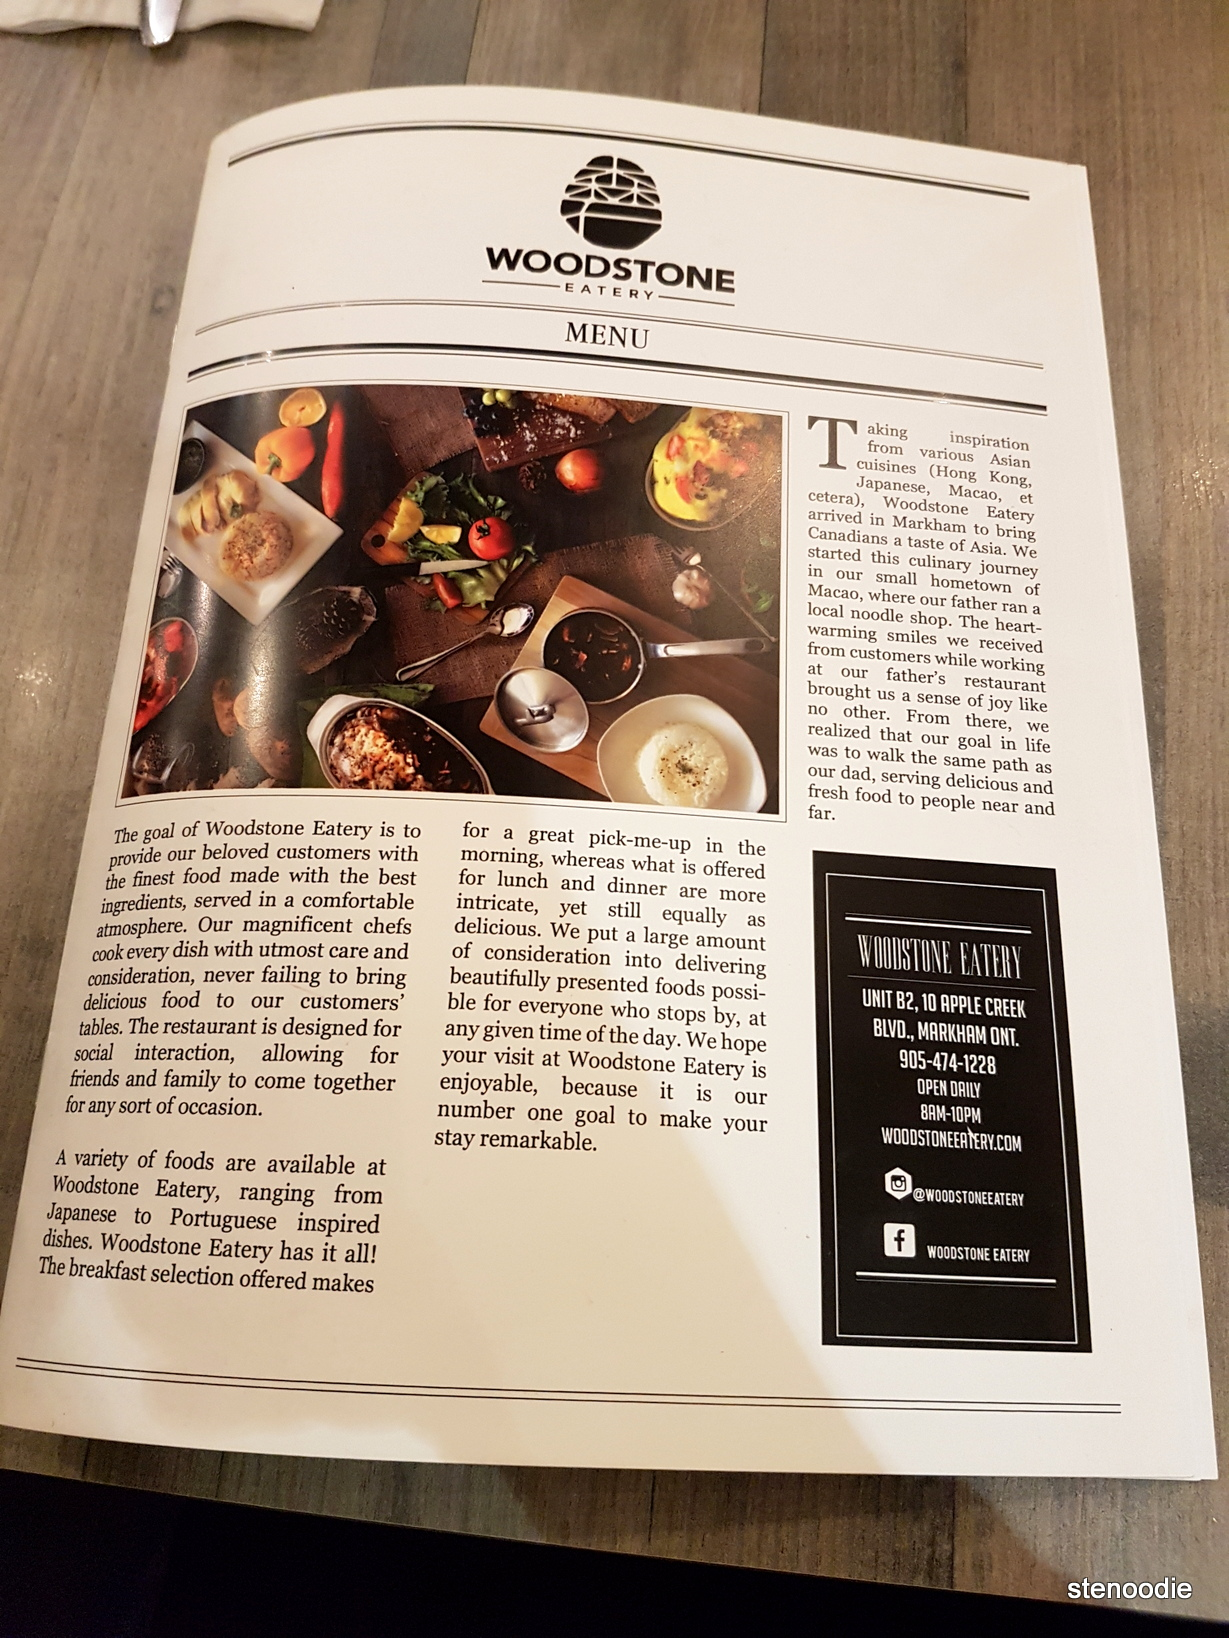 Woodstone Eatery menu cover